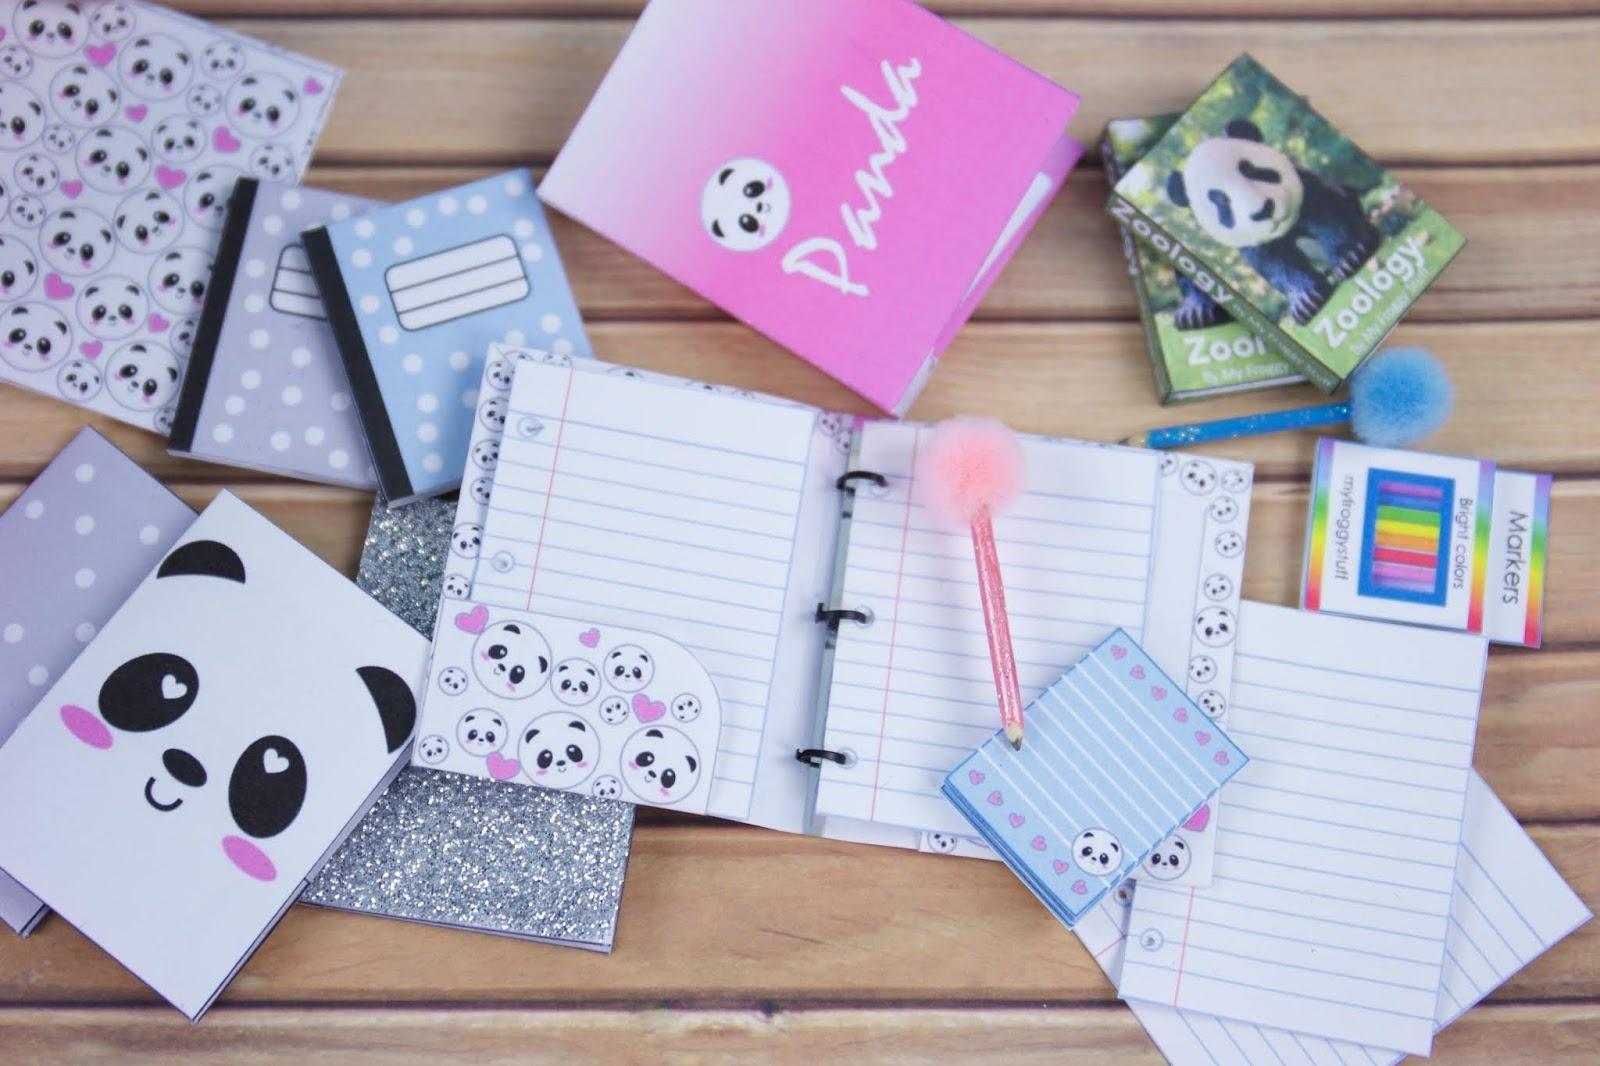 My Froggy Stuff: Back To School : Diy Panda School Supplies Free - Myfroggystuff Blogspot Free Printables